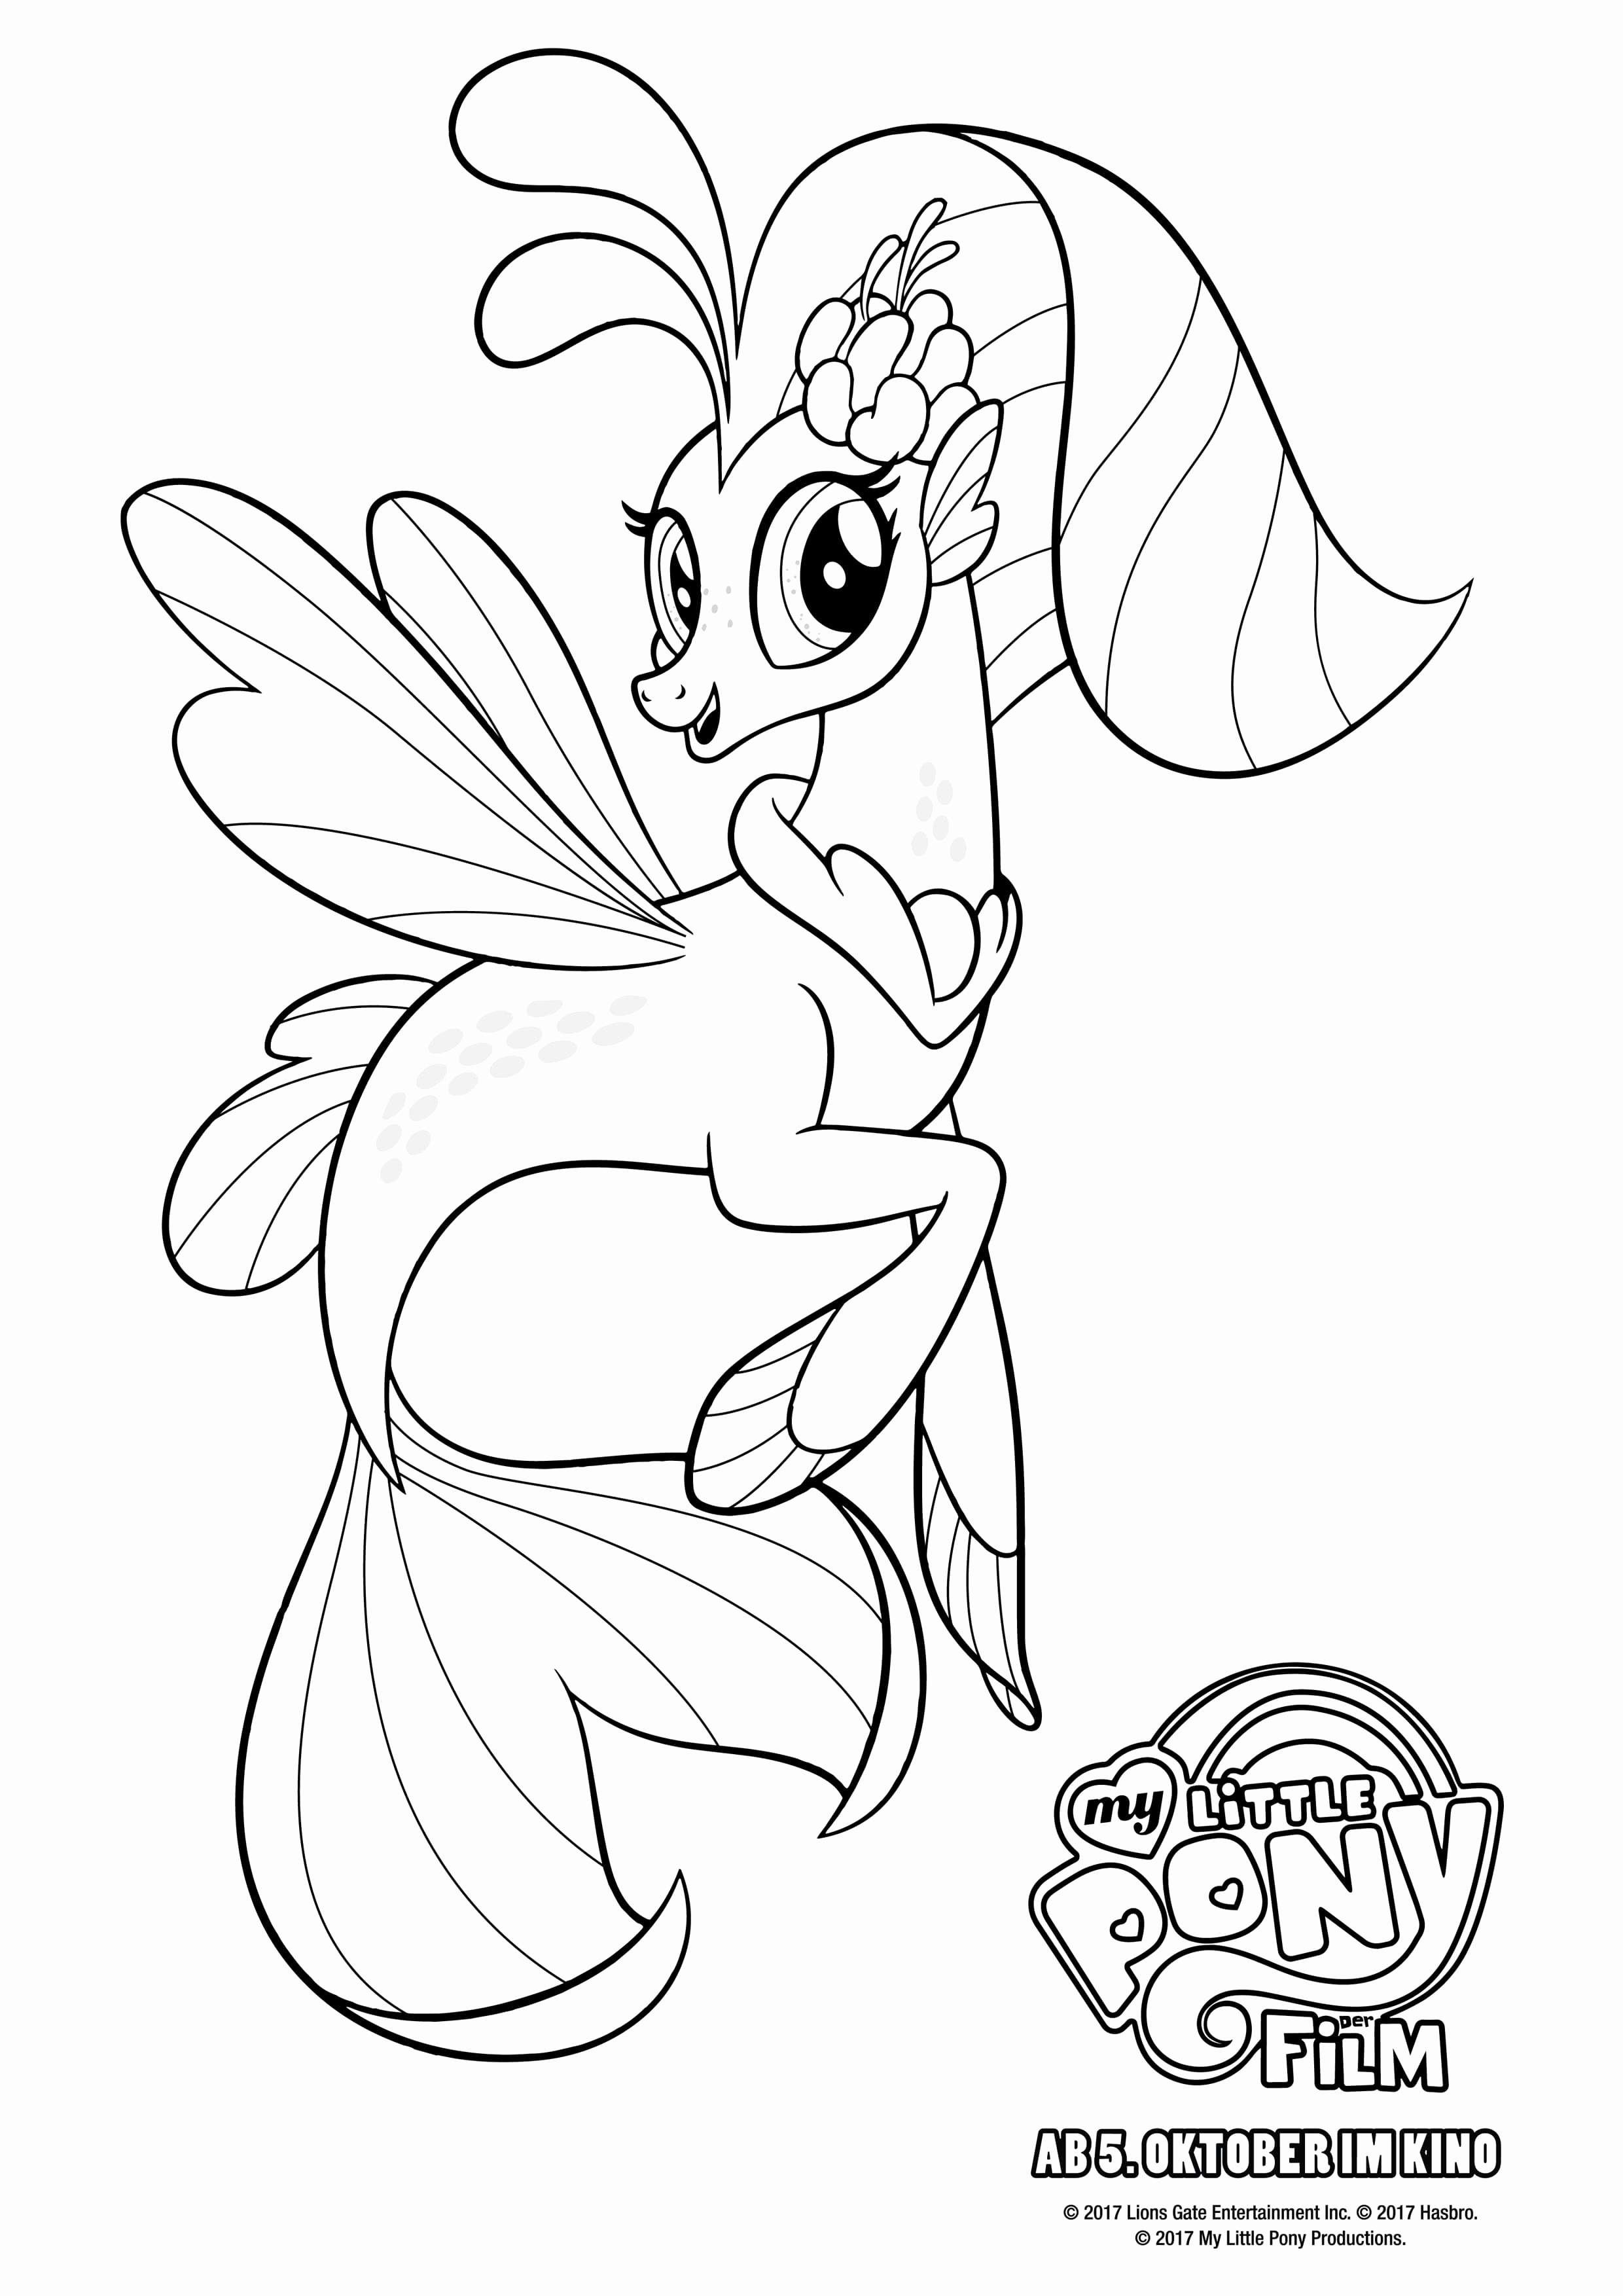 Equestria Girls Ausmalbilder Genial My Little Pony Princess Celestia Download 54 Genial Bilder Neu My Sammlung